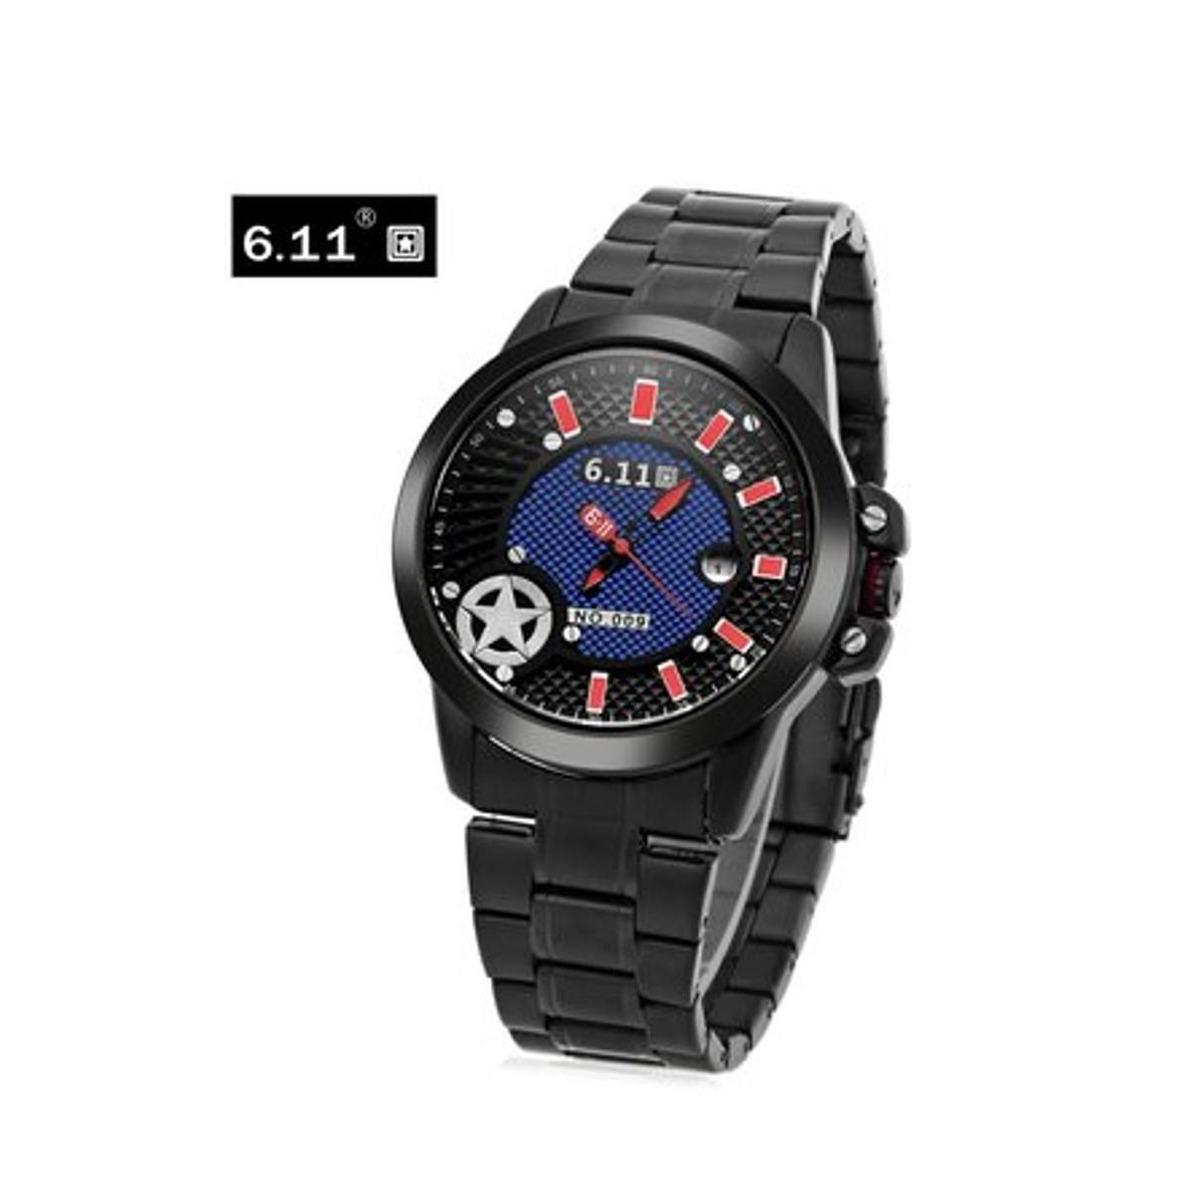 Mineral V 6 Caballero Reloj Para No De Cuarzo 11 Yf7gbyv6